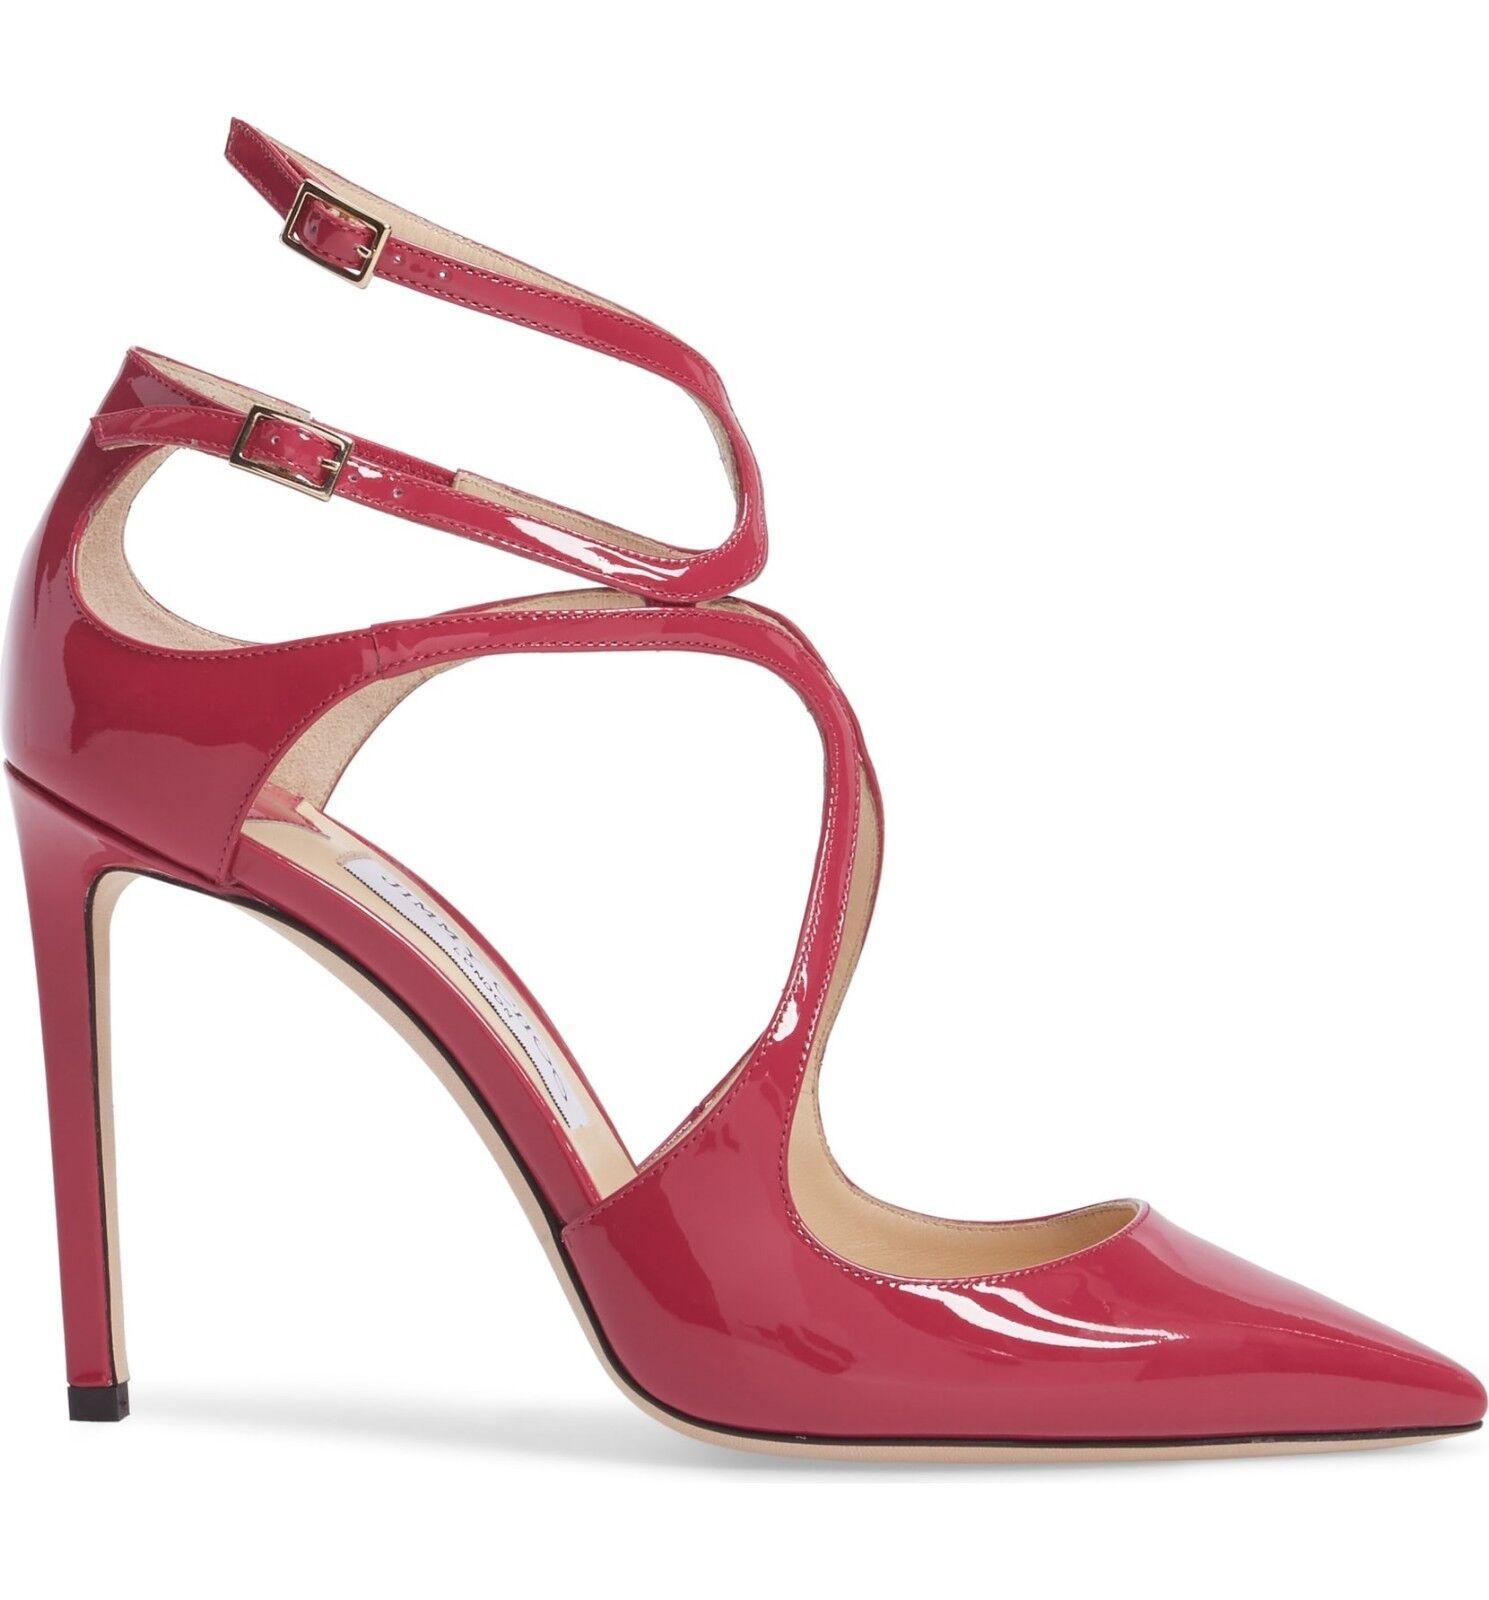 Nuevo En Caja  795 Jimmy Choo Lancer Zapato tacón de tacón Zapato Bomba Con Tiras Cerise rosado patente 39 - 8.5 969917